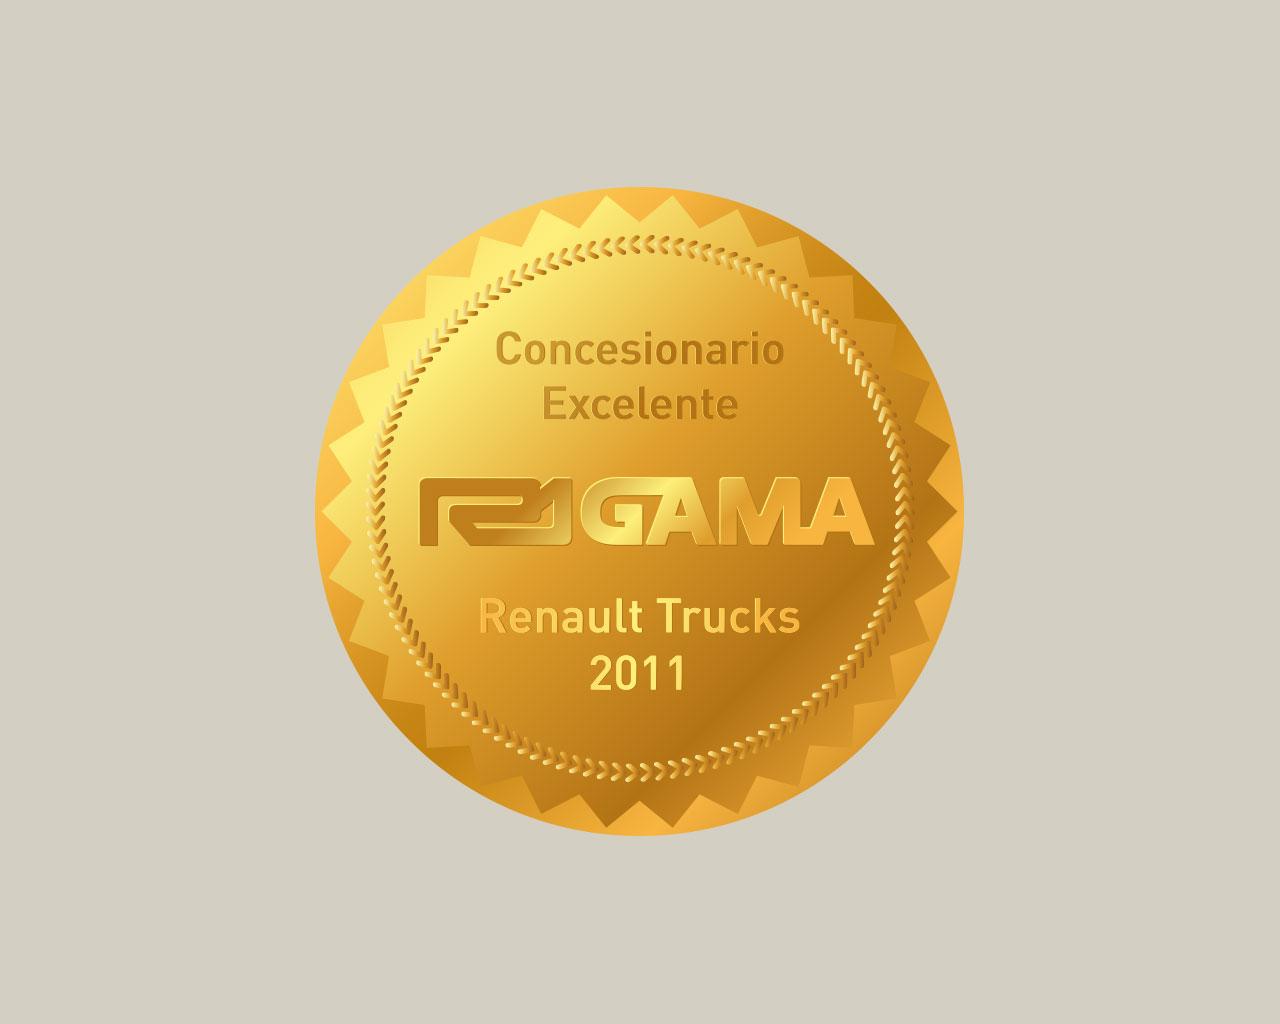 Sello Concesionario Excelente - R1GAMA